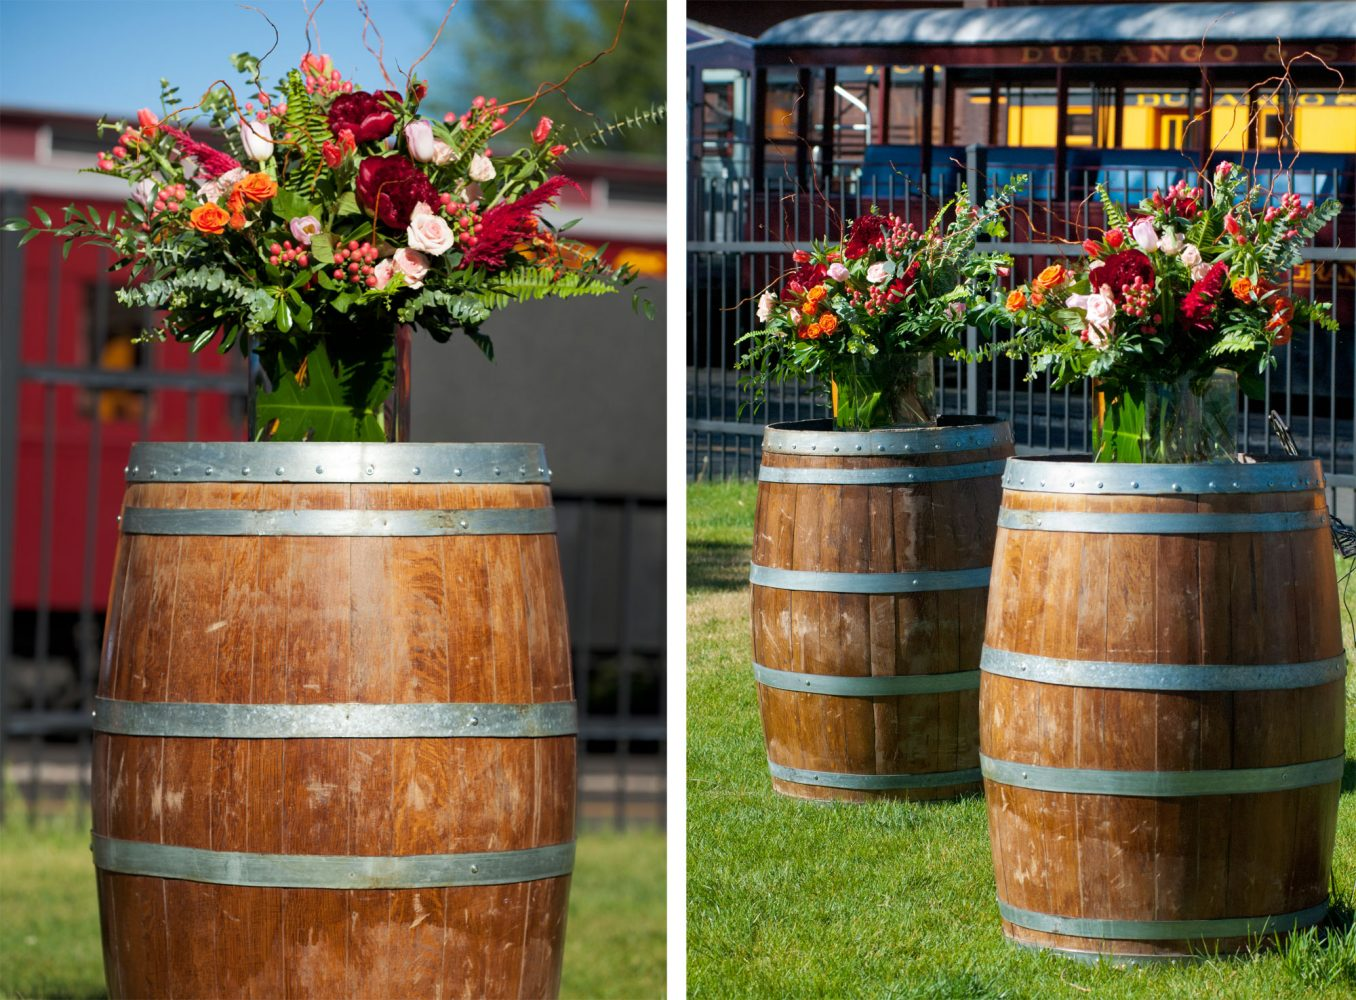 Gorgeous ceremony with wedding bouquets from April's Garden weddings, Durango, Colorado